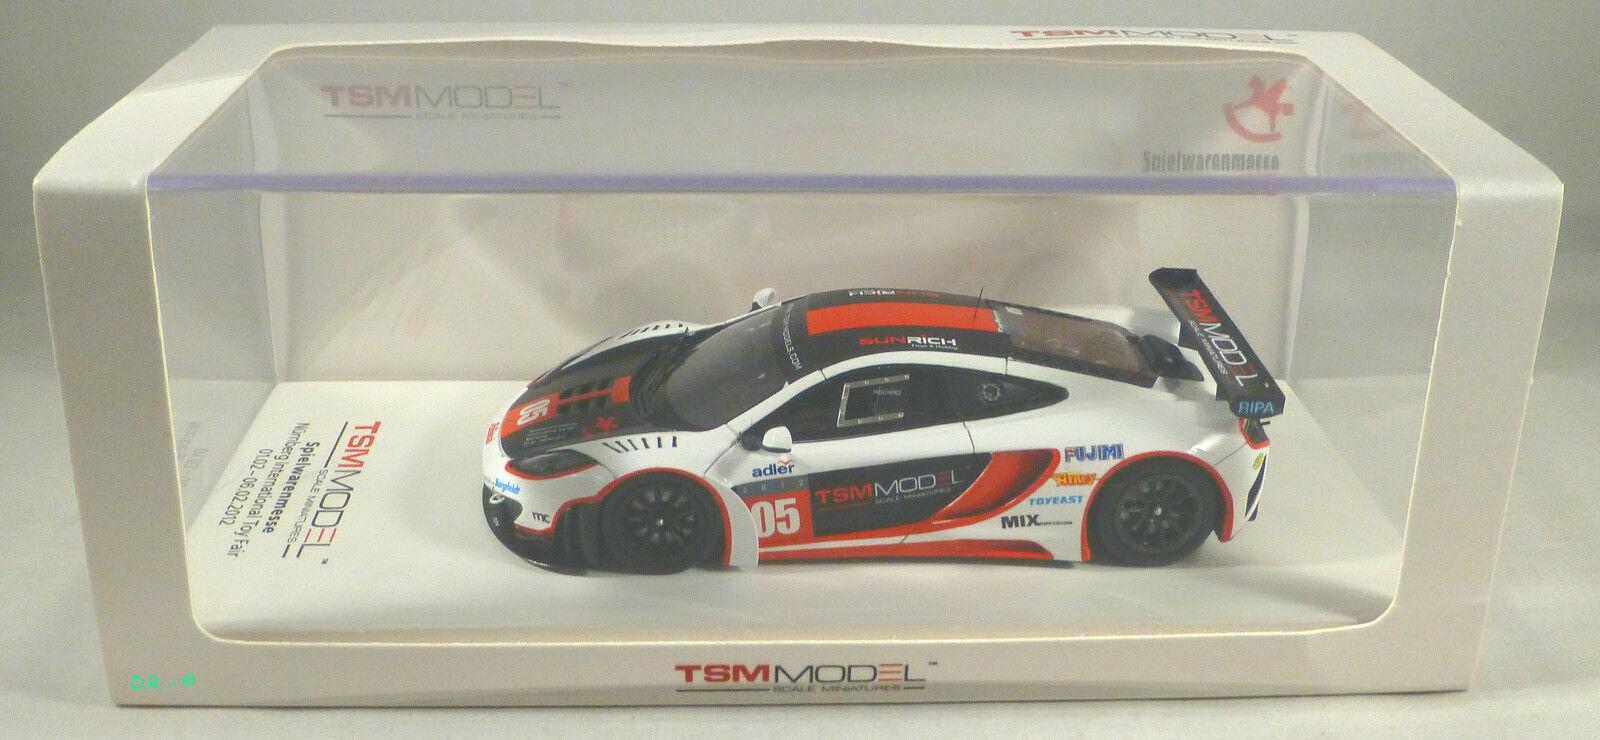 MCLAREN MP4 12C GT3  5 Spielwarenmesse Toy Fair Nurnberg 2012 TSM TRUESCALE 1 43